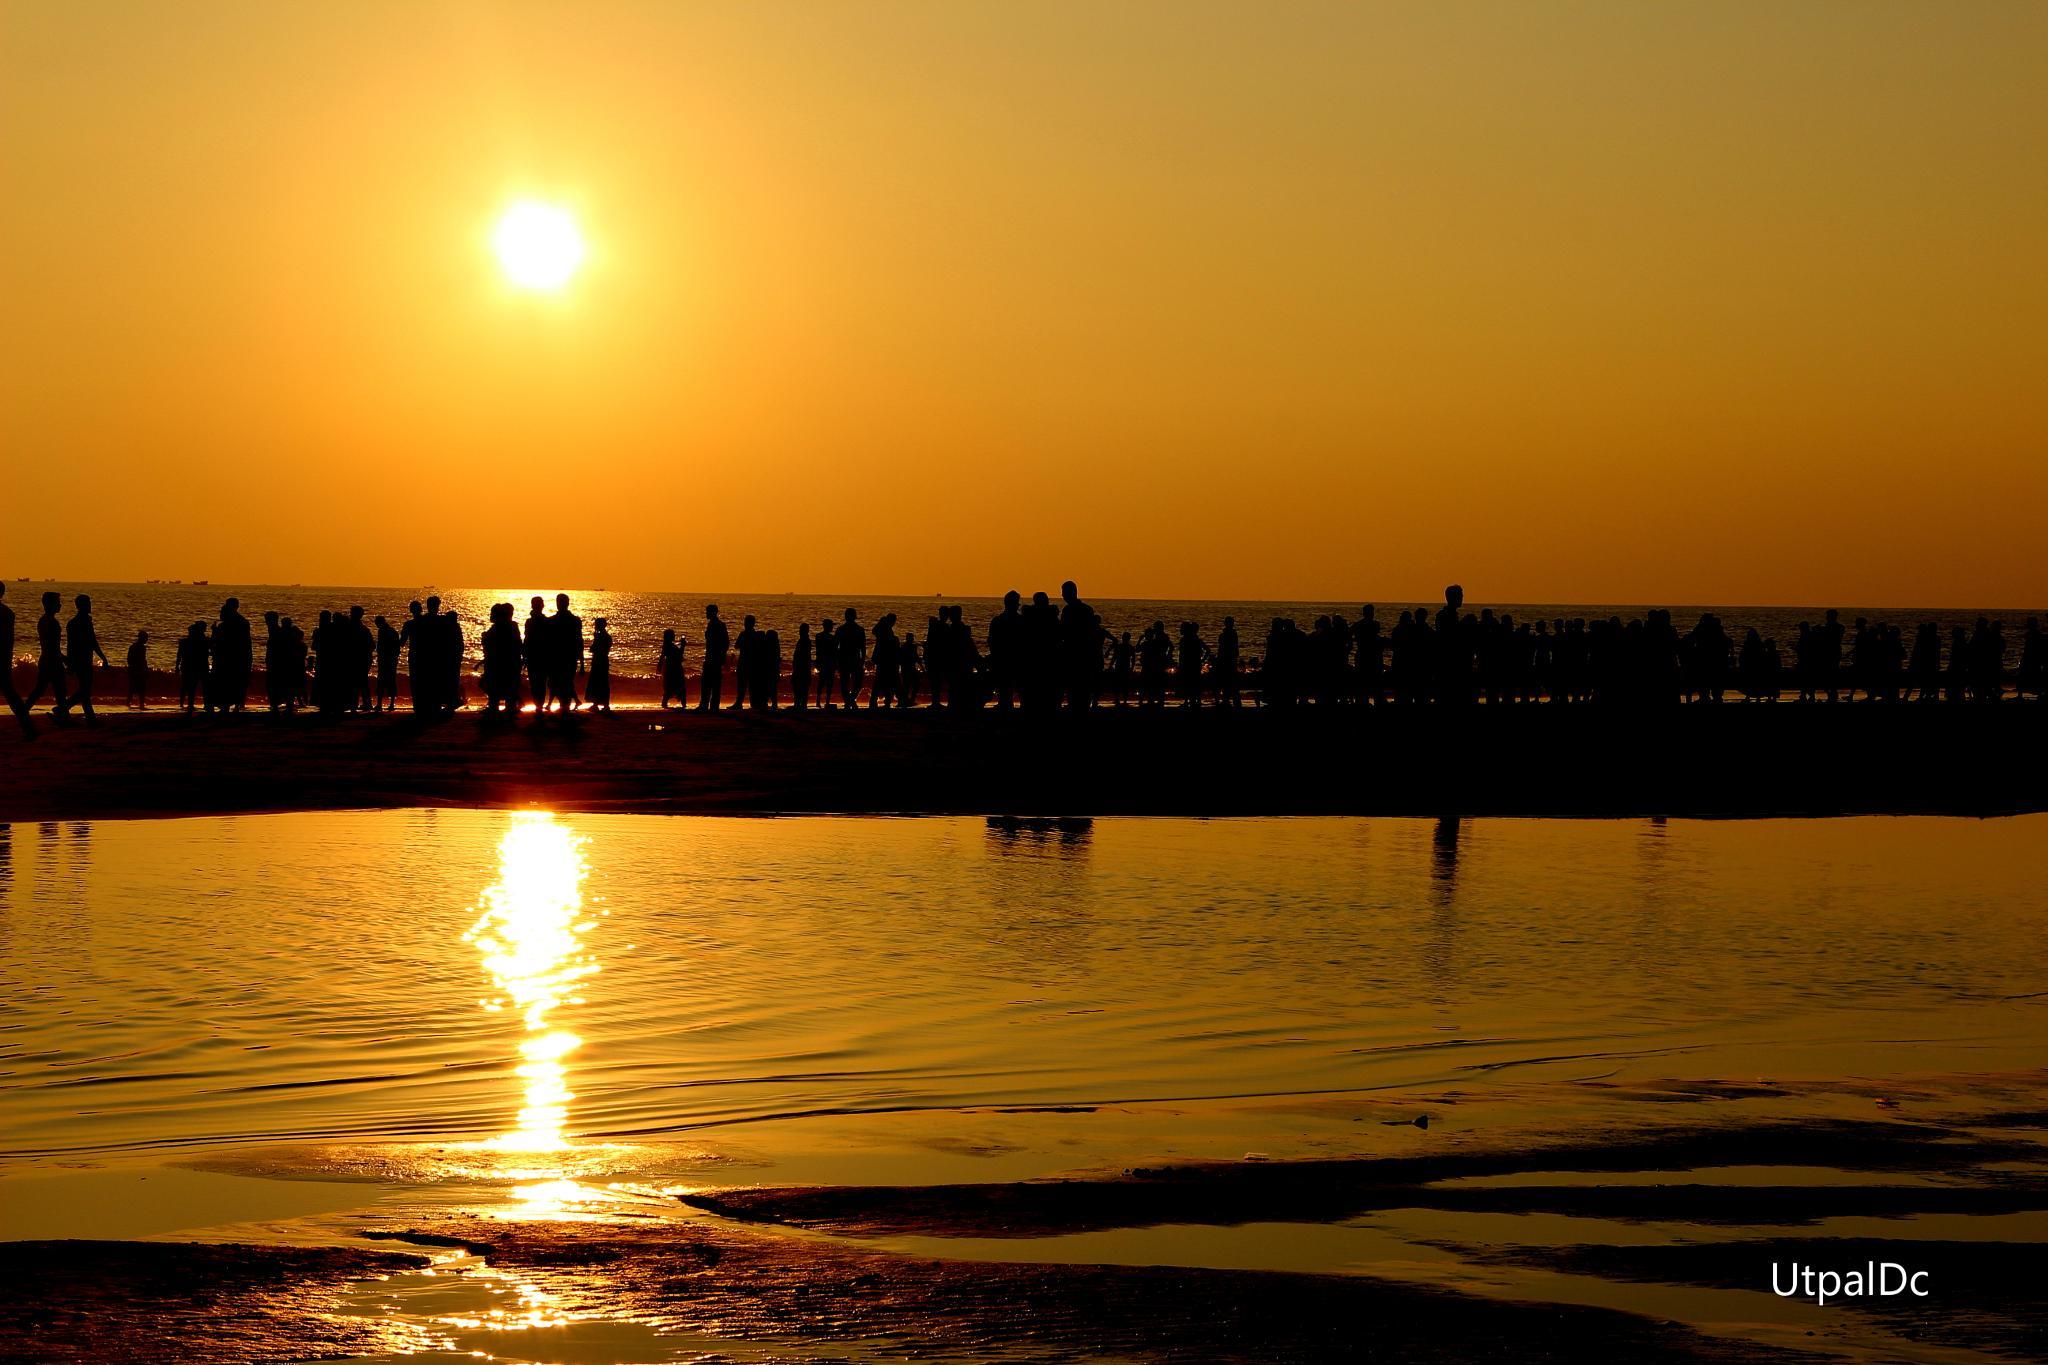 SunSet by Utpal Dey Chowdhury